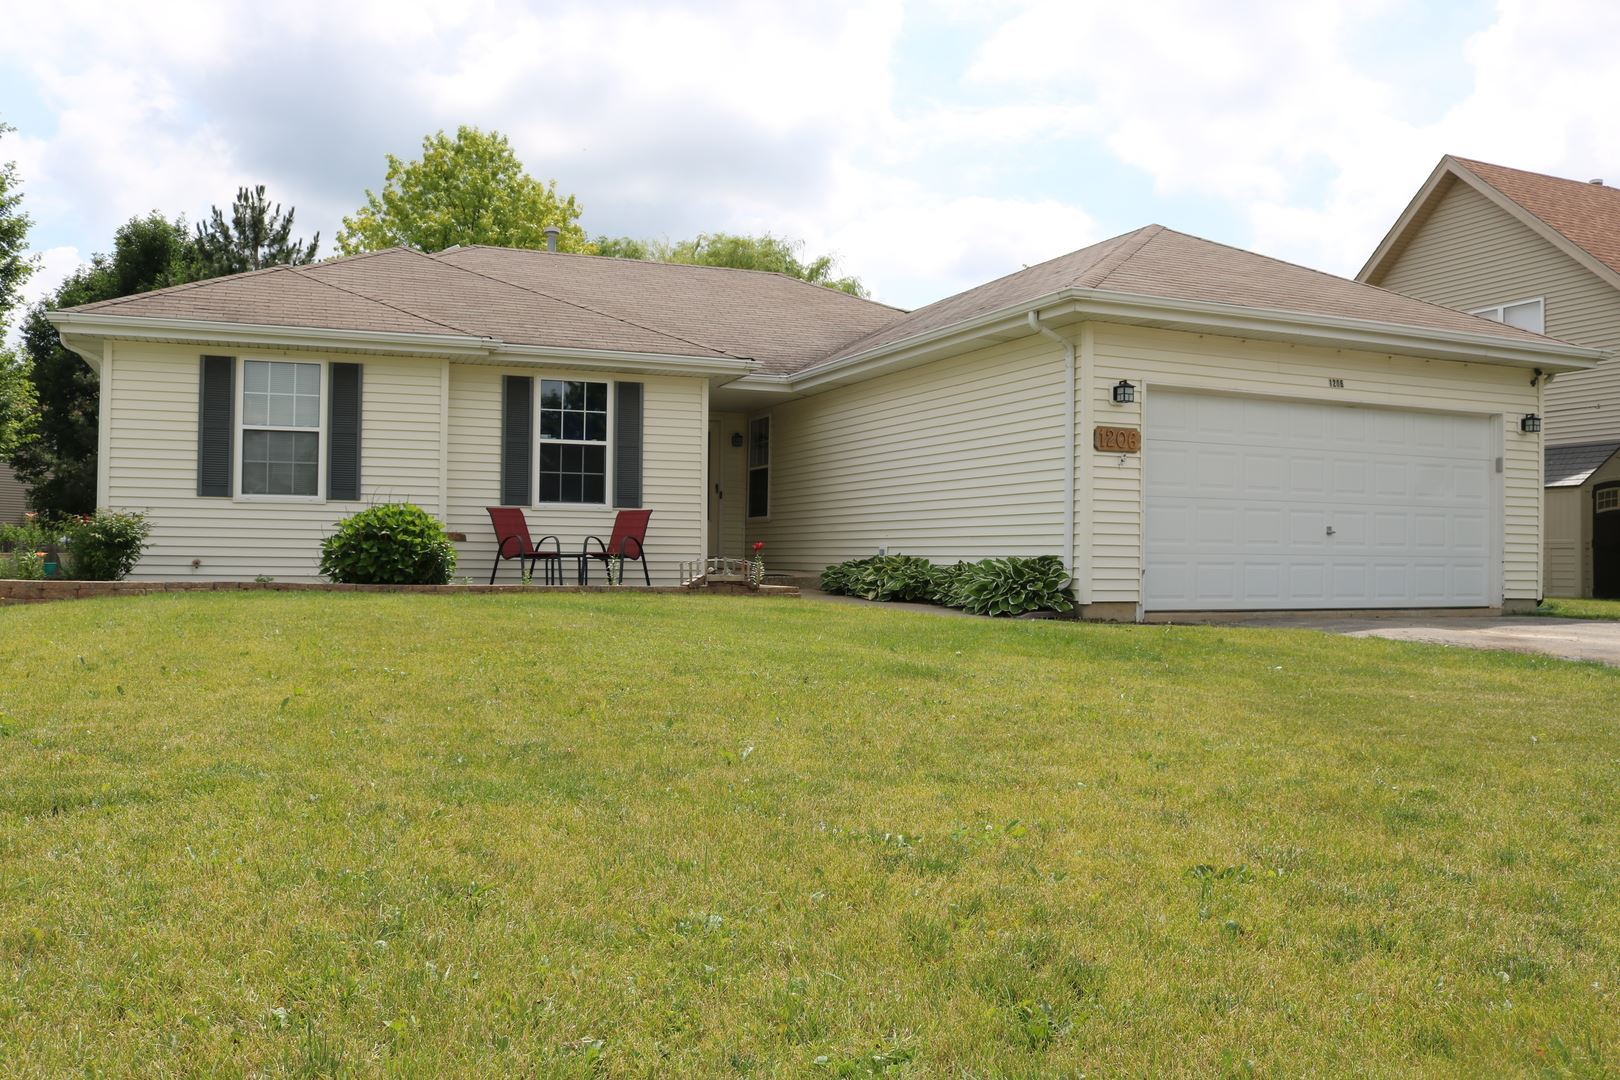 1206 Quail Drive, Plainfield, IL 60586 - #: 10763861